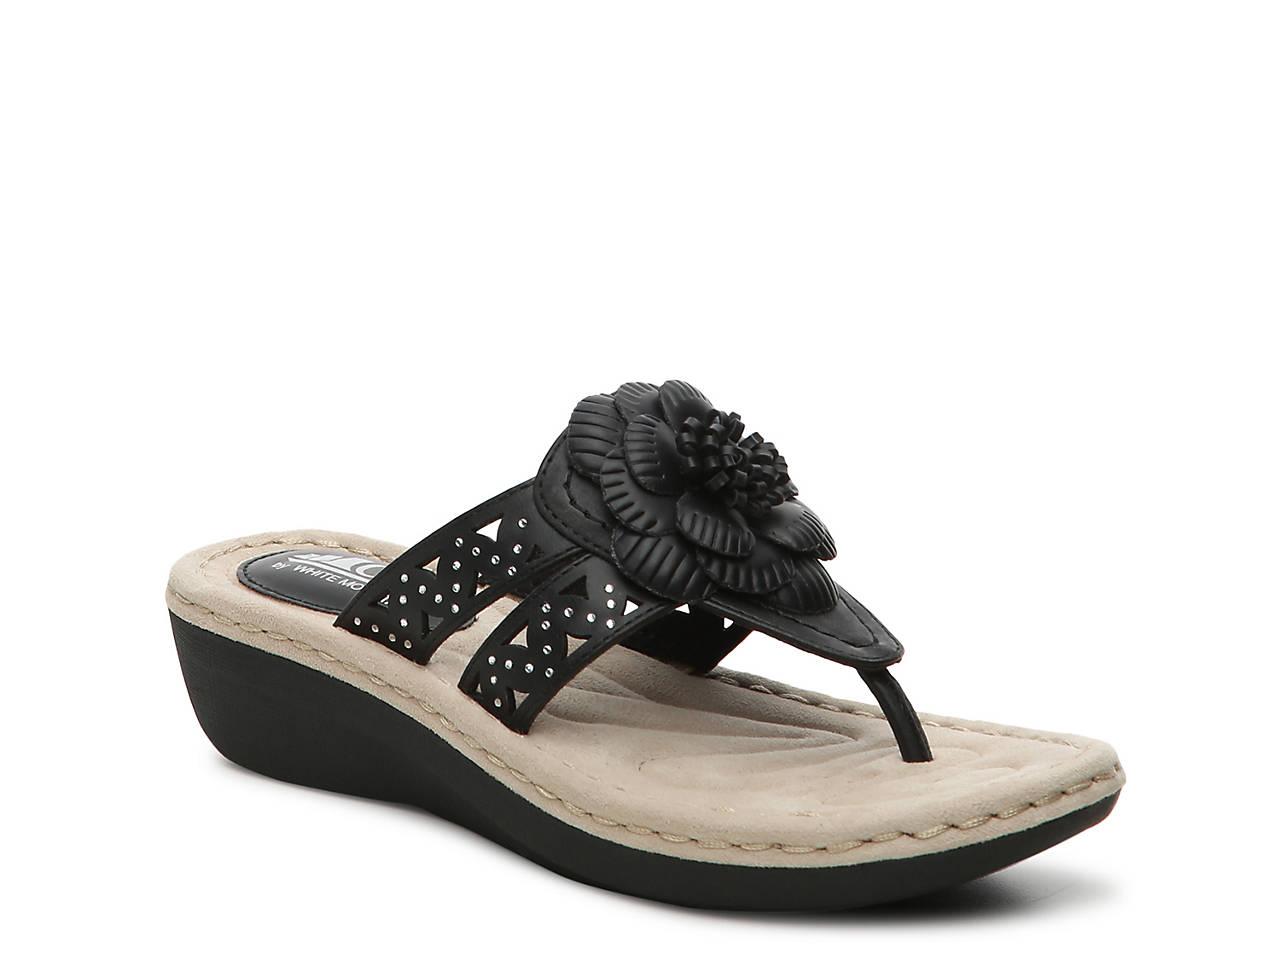 ed9965e4adba Cliffs by White Mountain Cynthia Wedge Sandal Women s Shoes